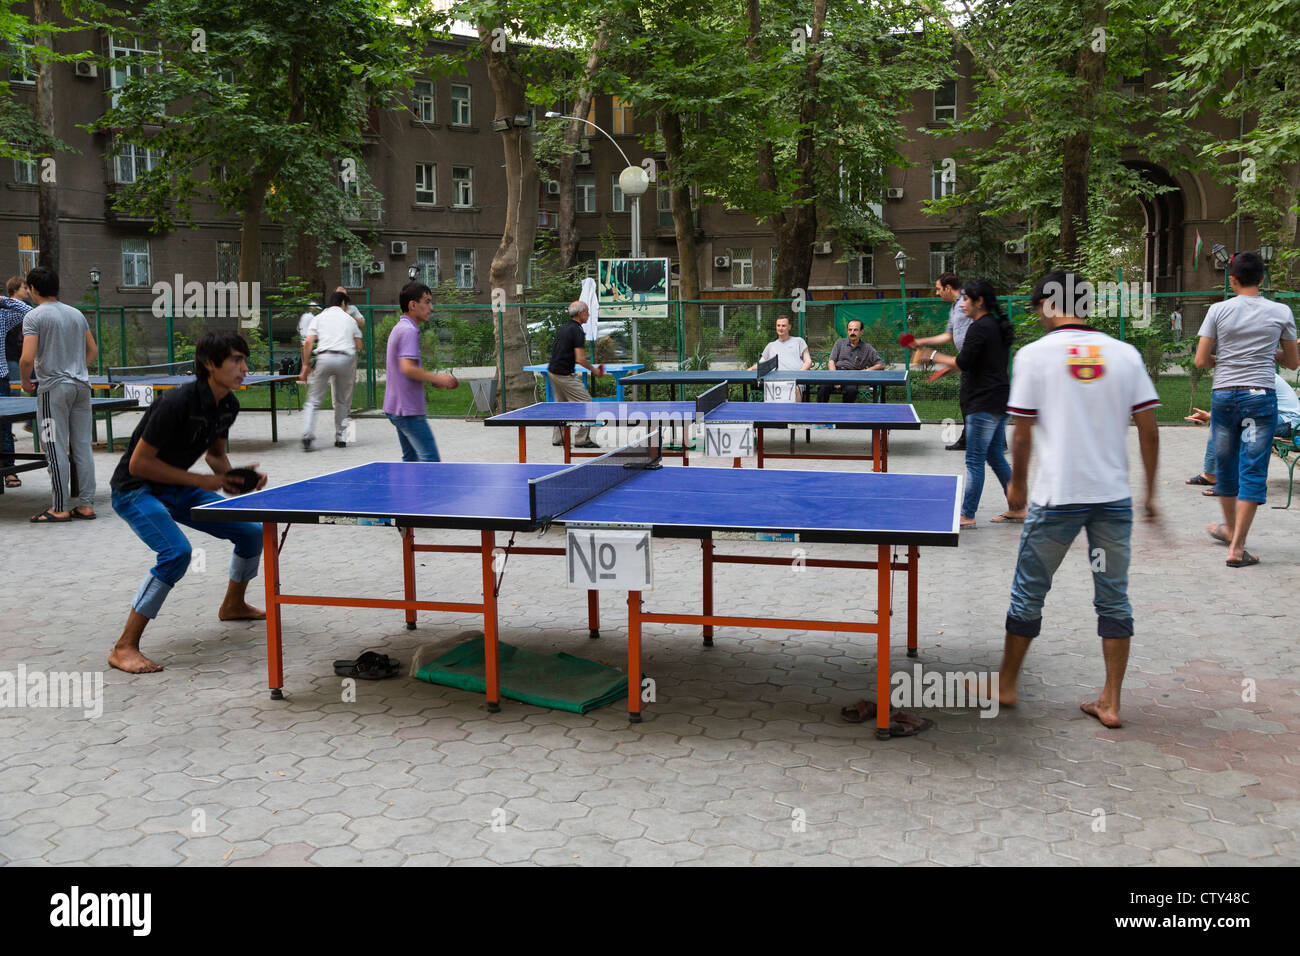 Giovani giocando a ping-pong su tavoli all aperto a Dushanbe, Tagikistan Immagini Stock